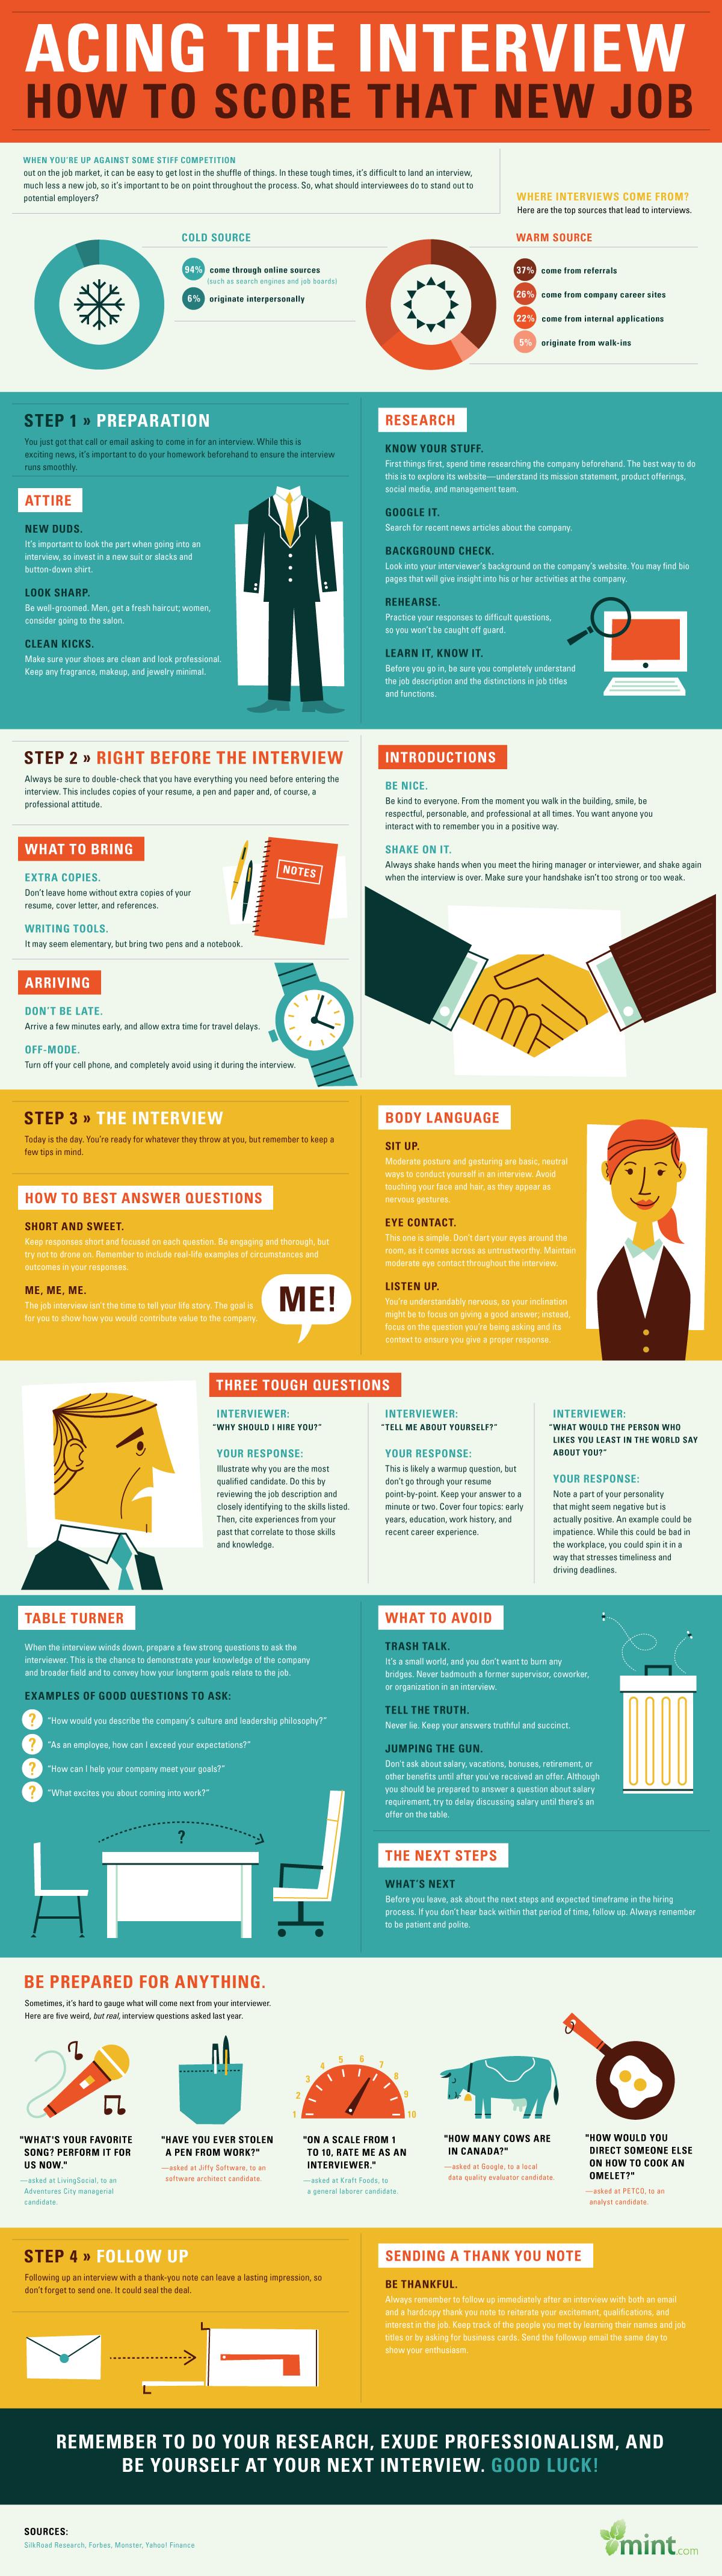 The Job Sauce Thejobsauce Profile Pinterest